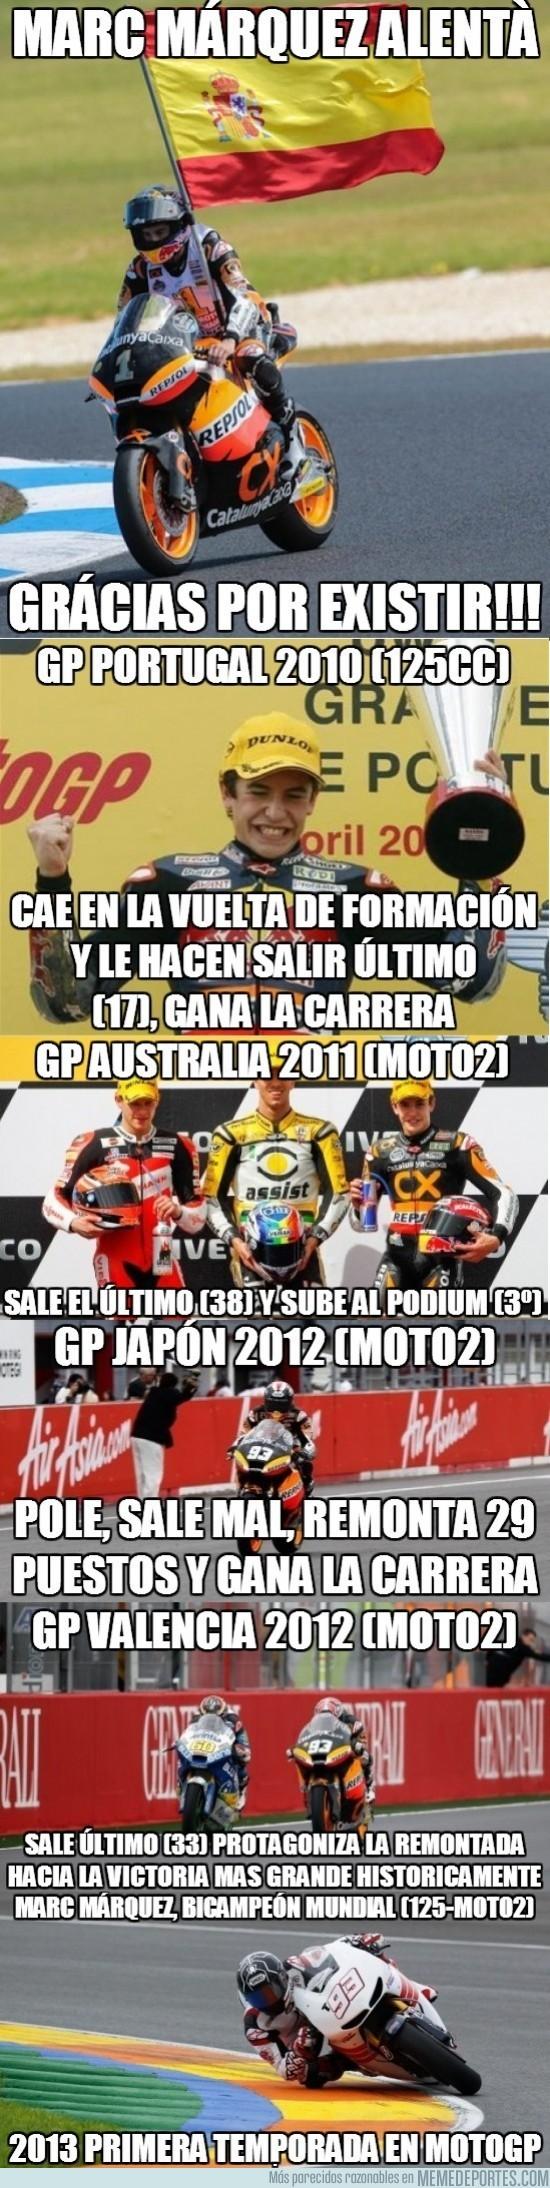 44739 - Marc Márquez Alentà, te esperamos en MotoGP